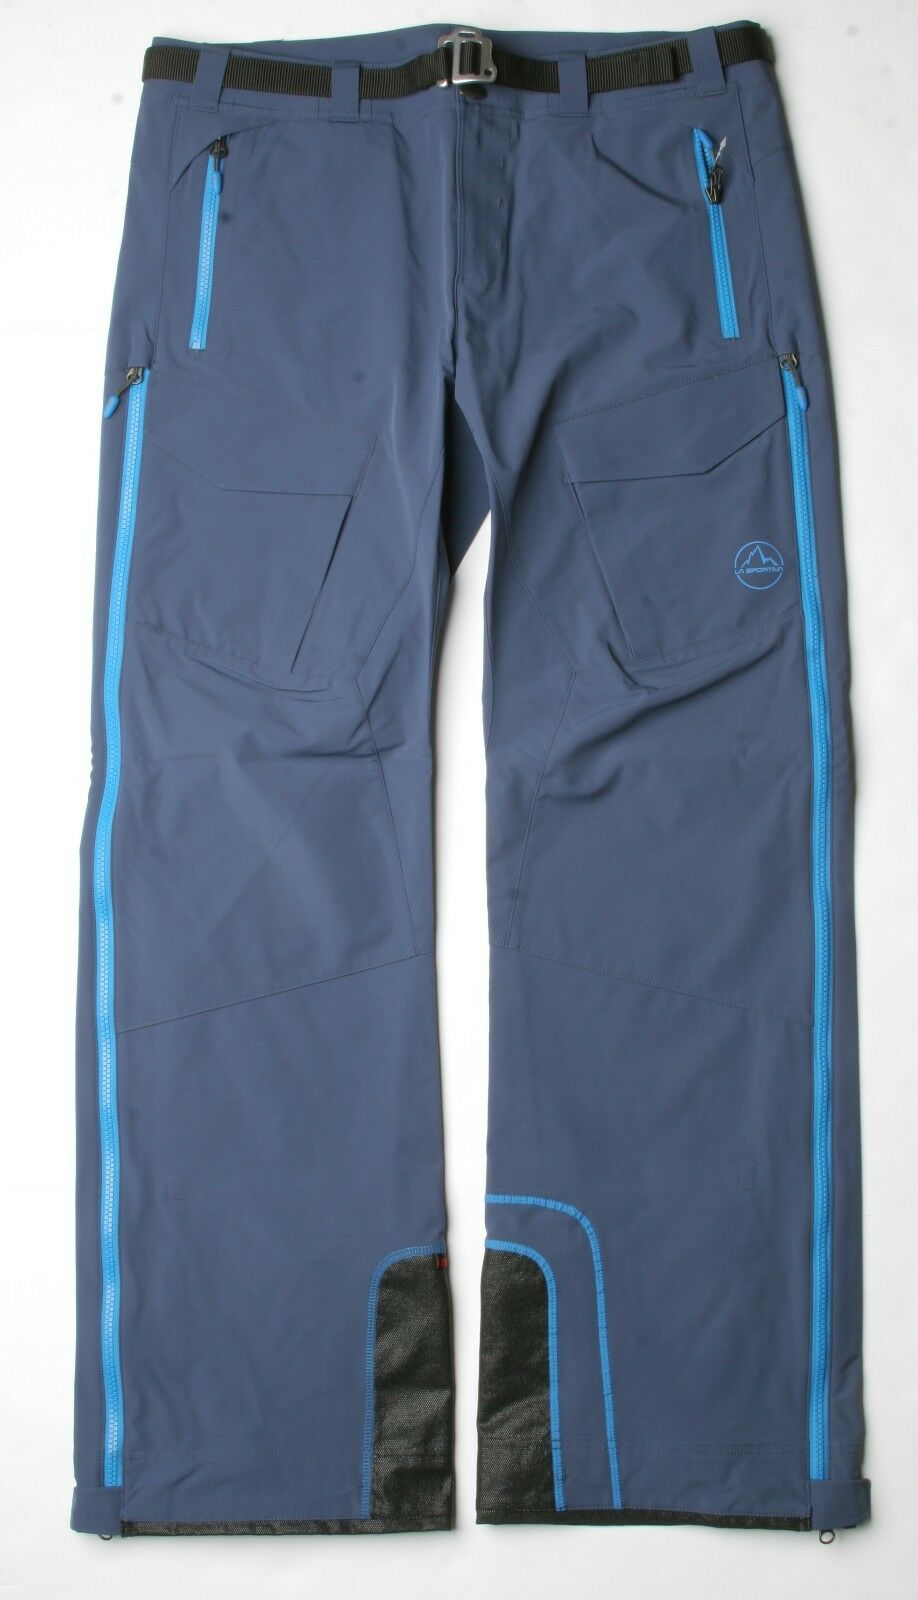 La Sportiva Aureola Pantalone (M) Blu Navy